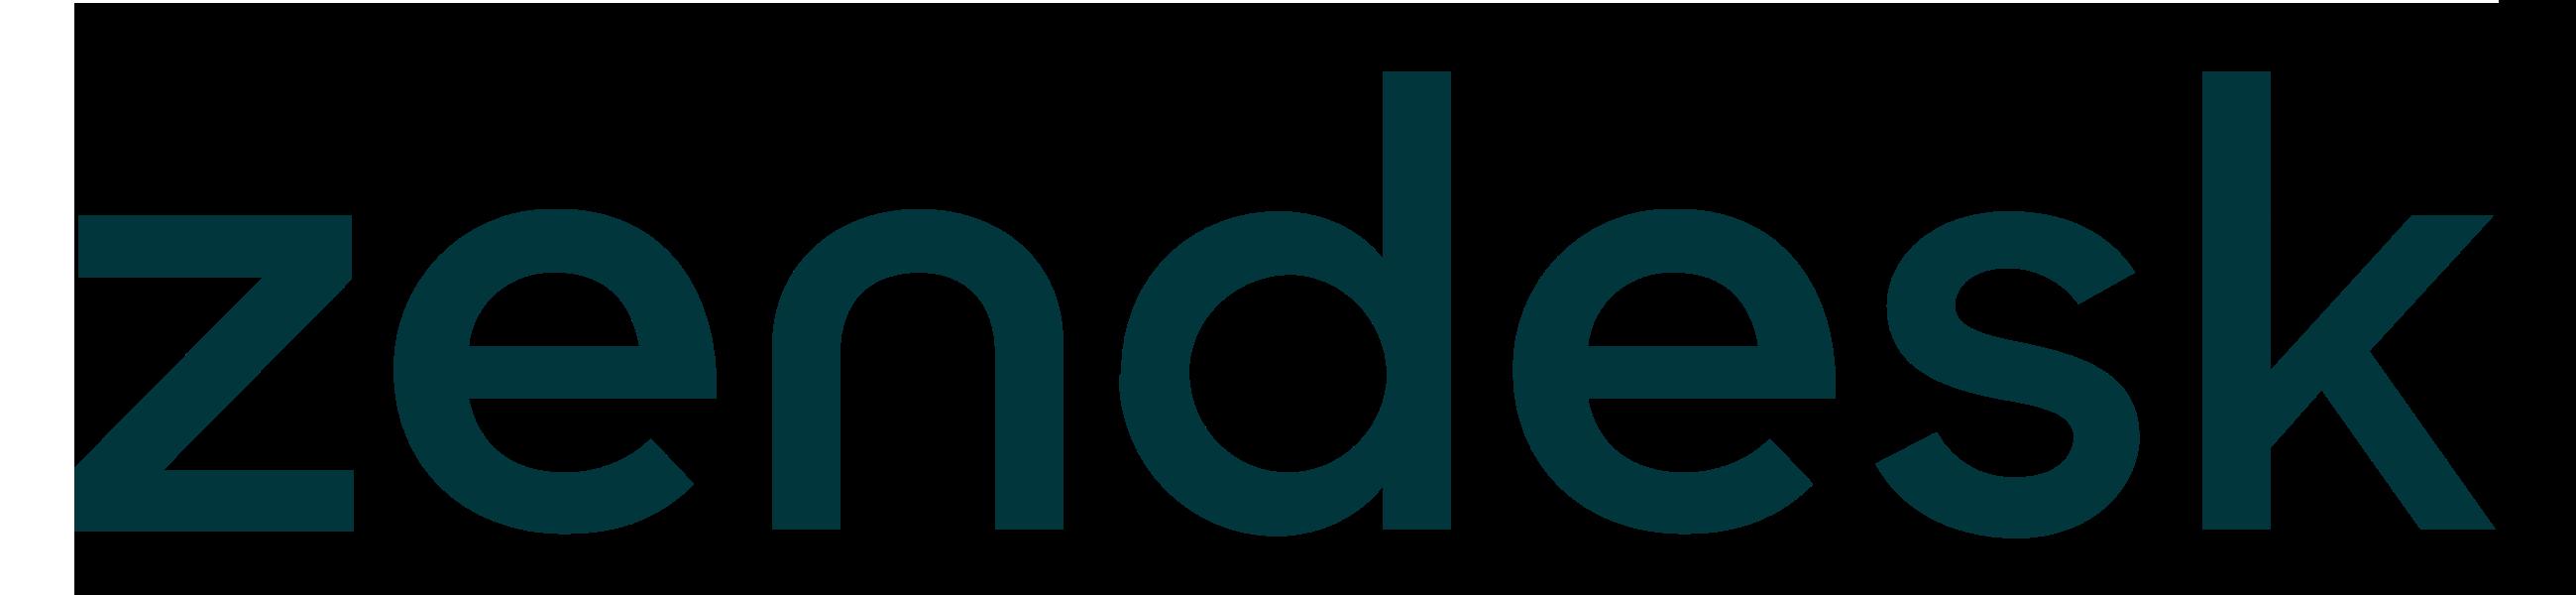 zendesk-png-zendesk-logo-wordmark-png-2599.png